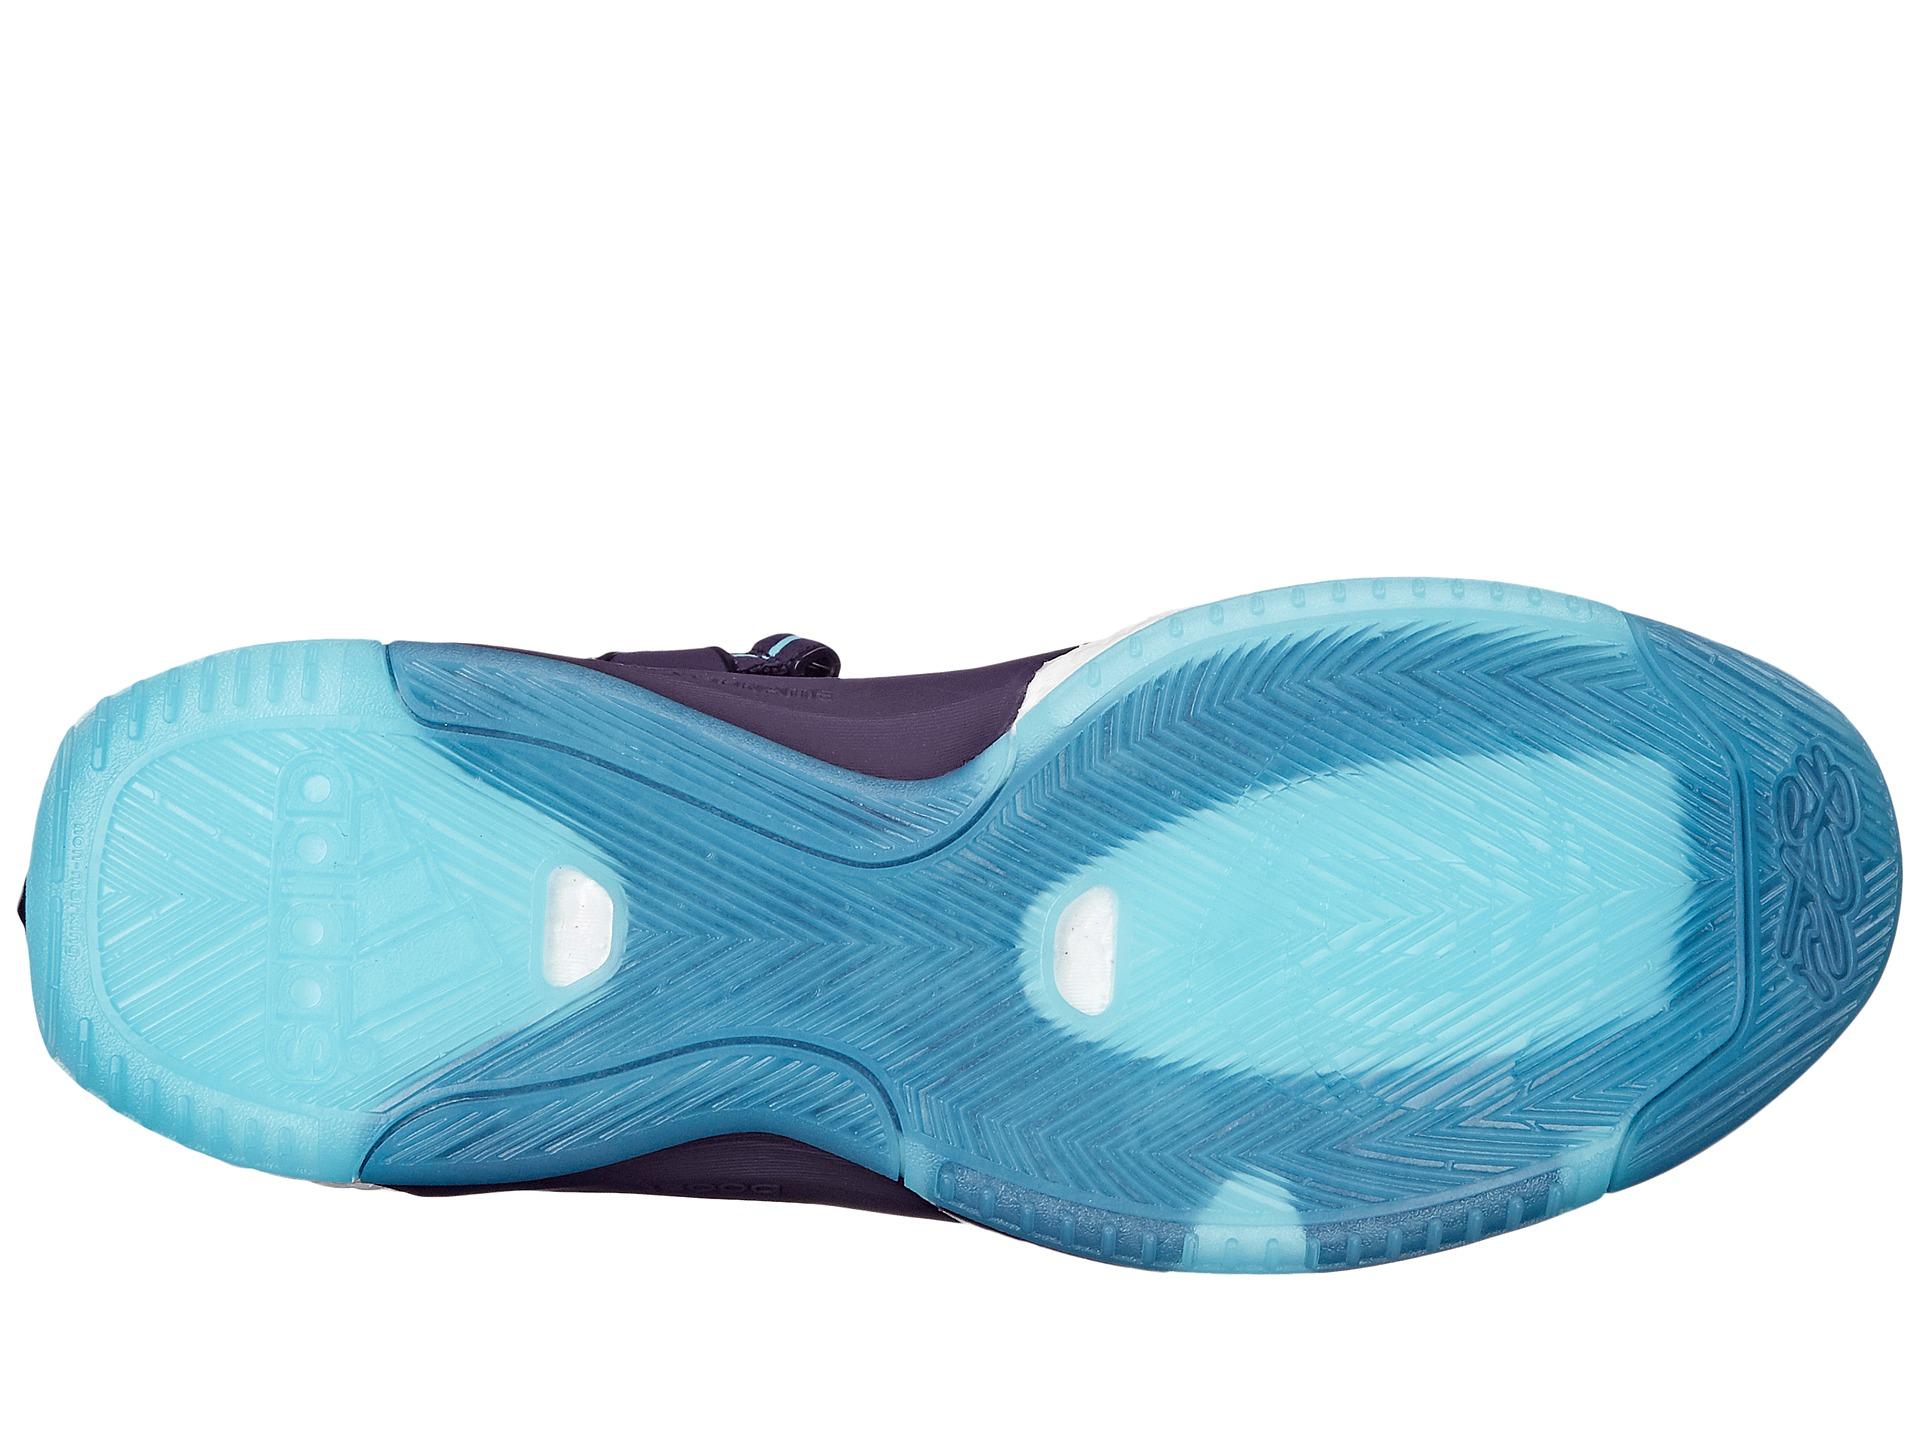 Derrick Rose Adidas Shoes Purple | squash-onderhoud info